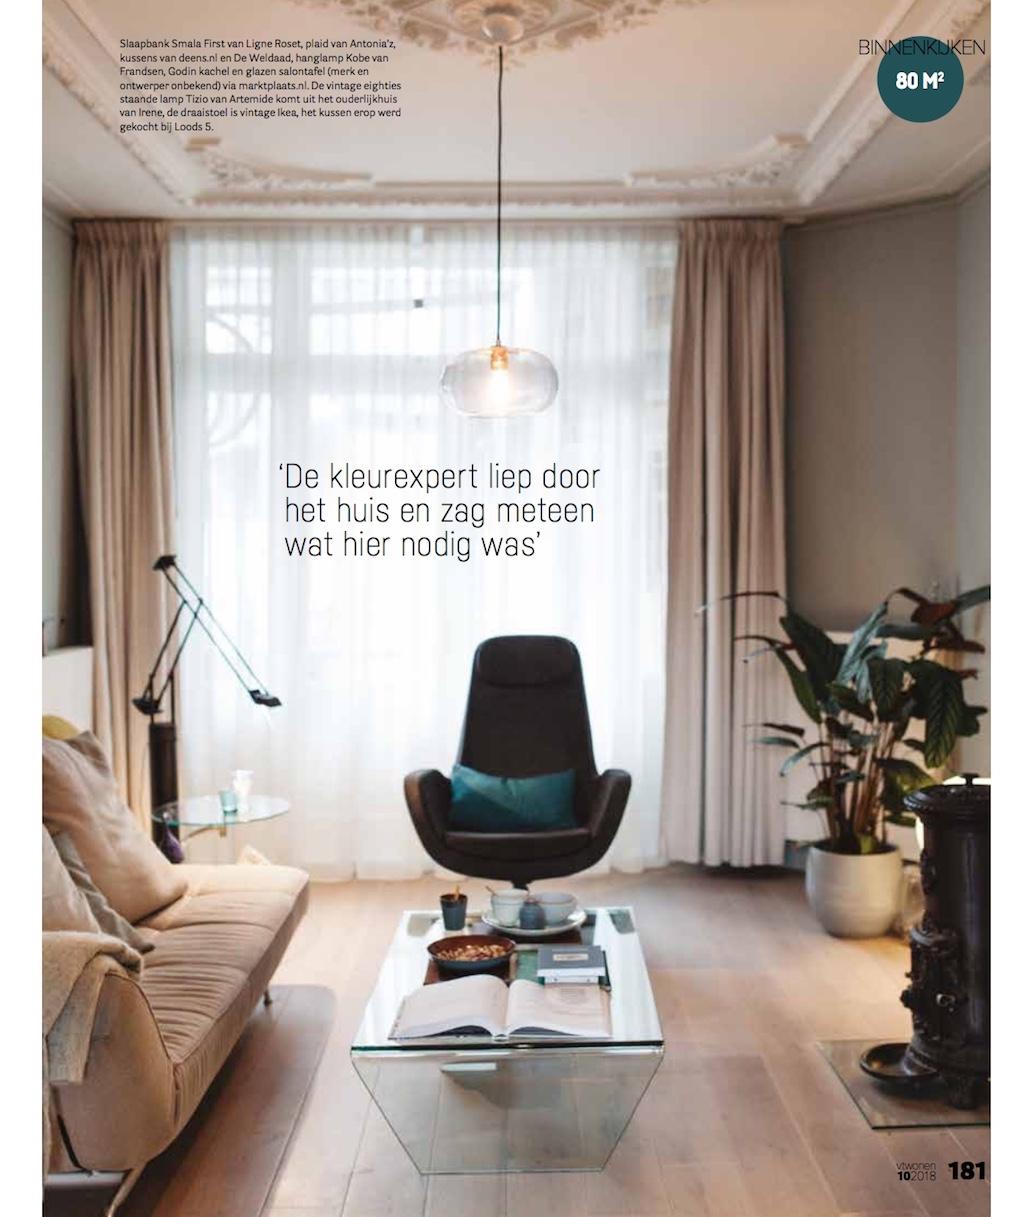 Design Salontafel Ligne Roset.Vt Wonen Lindividu Portfolio Of Linda Van Der Ham